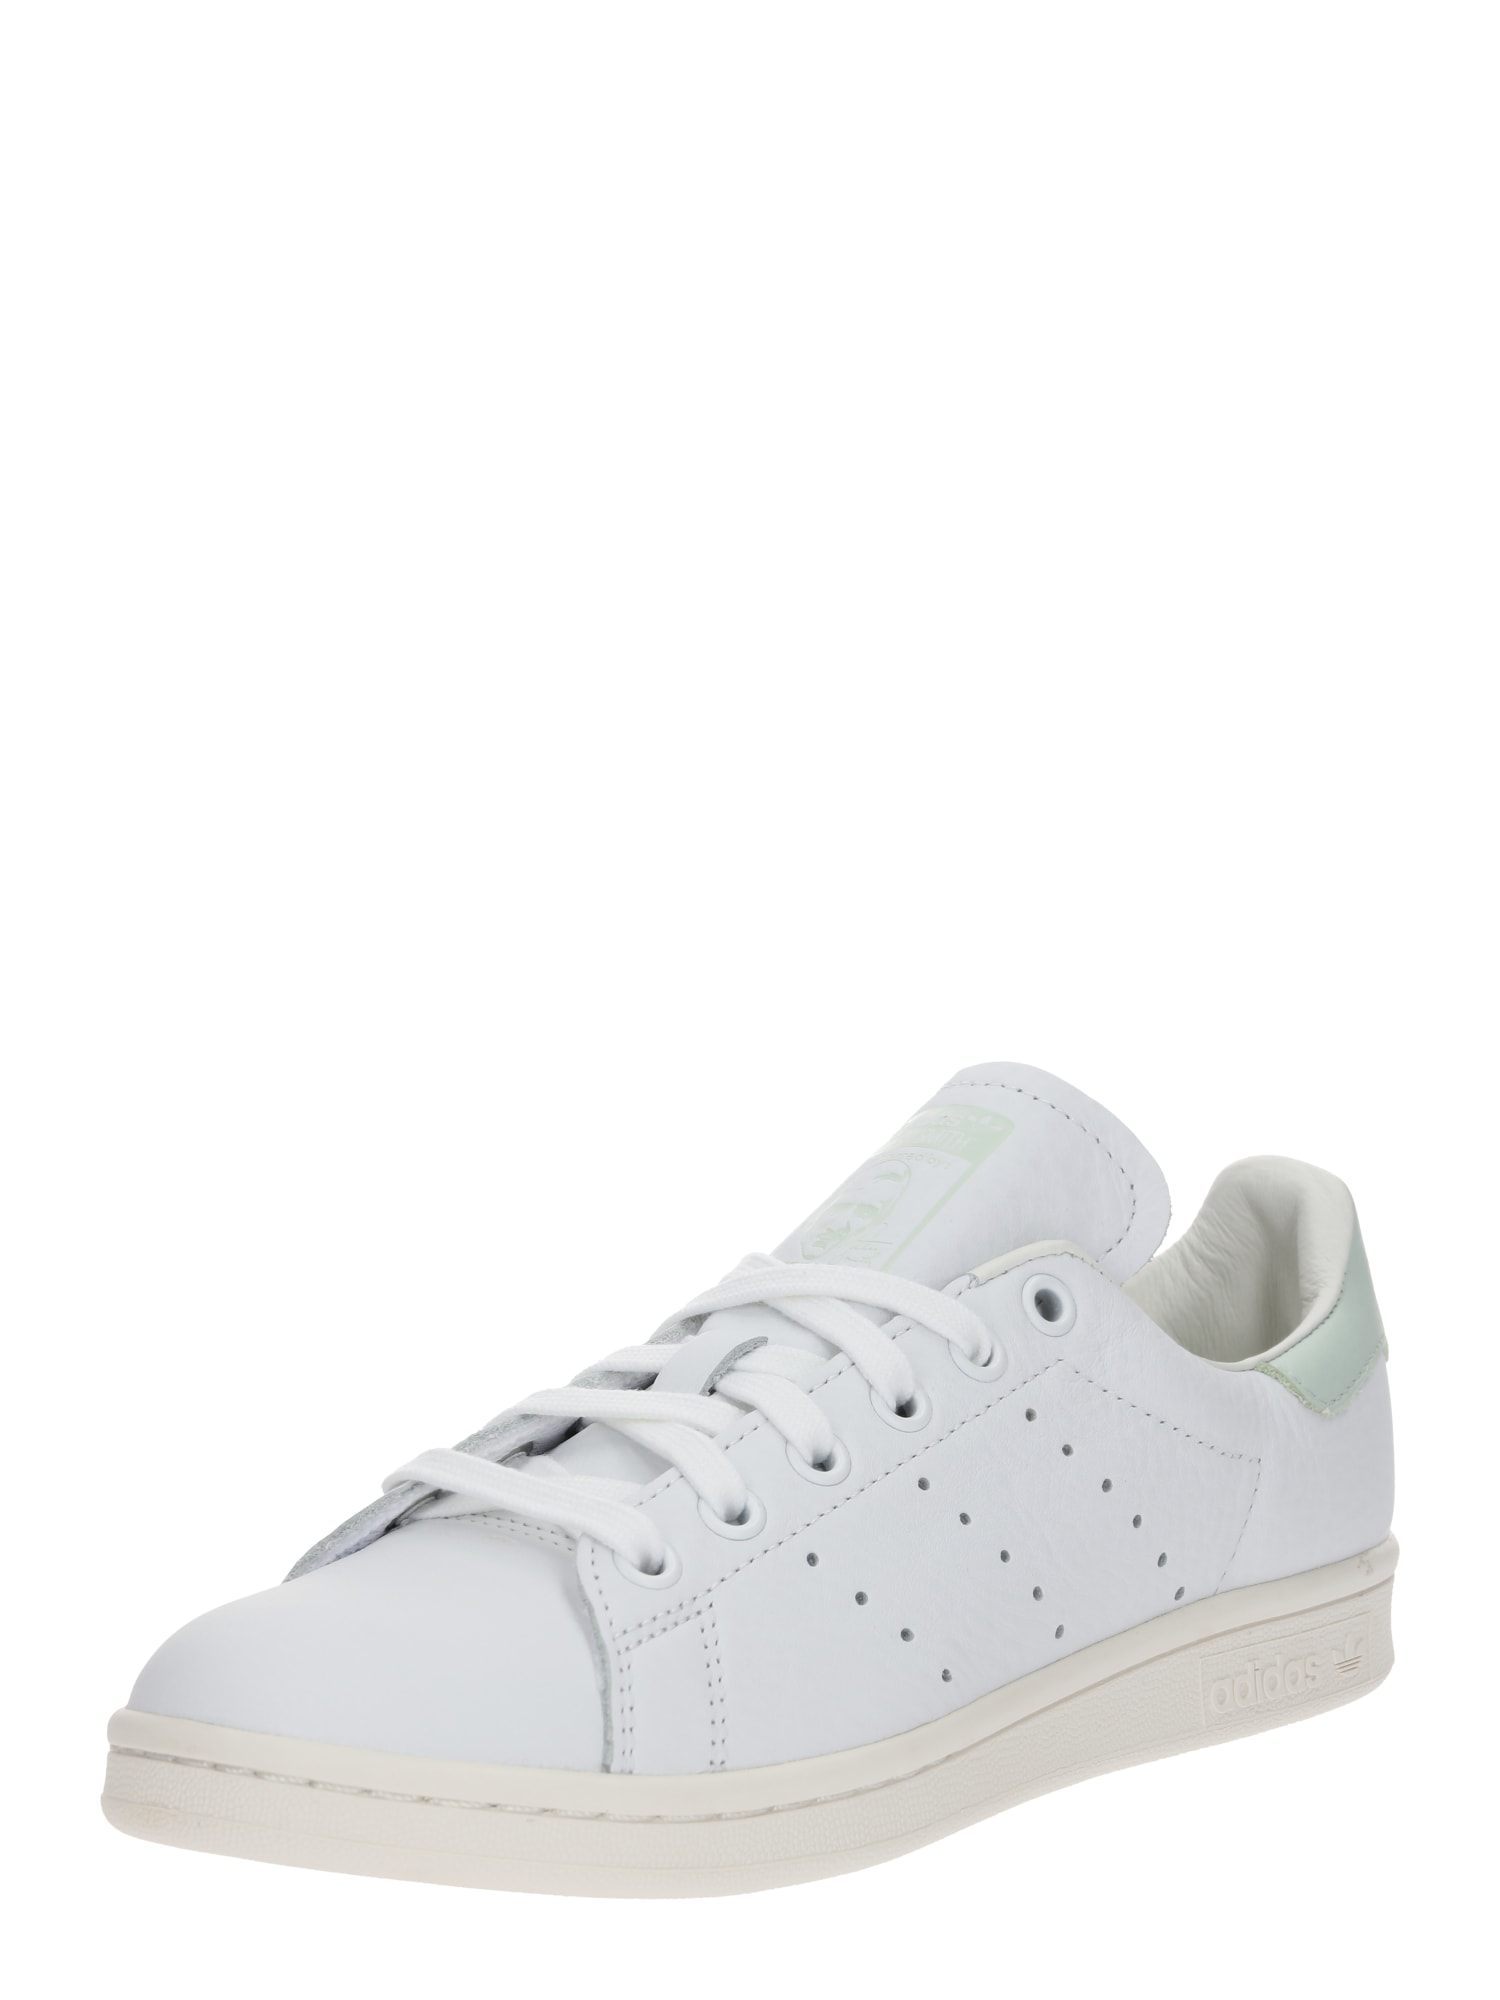 Tenisky Stan Smith  pastelově zelená  bílá ADIDAS ORIGINALS